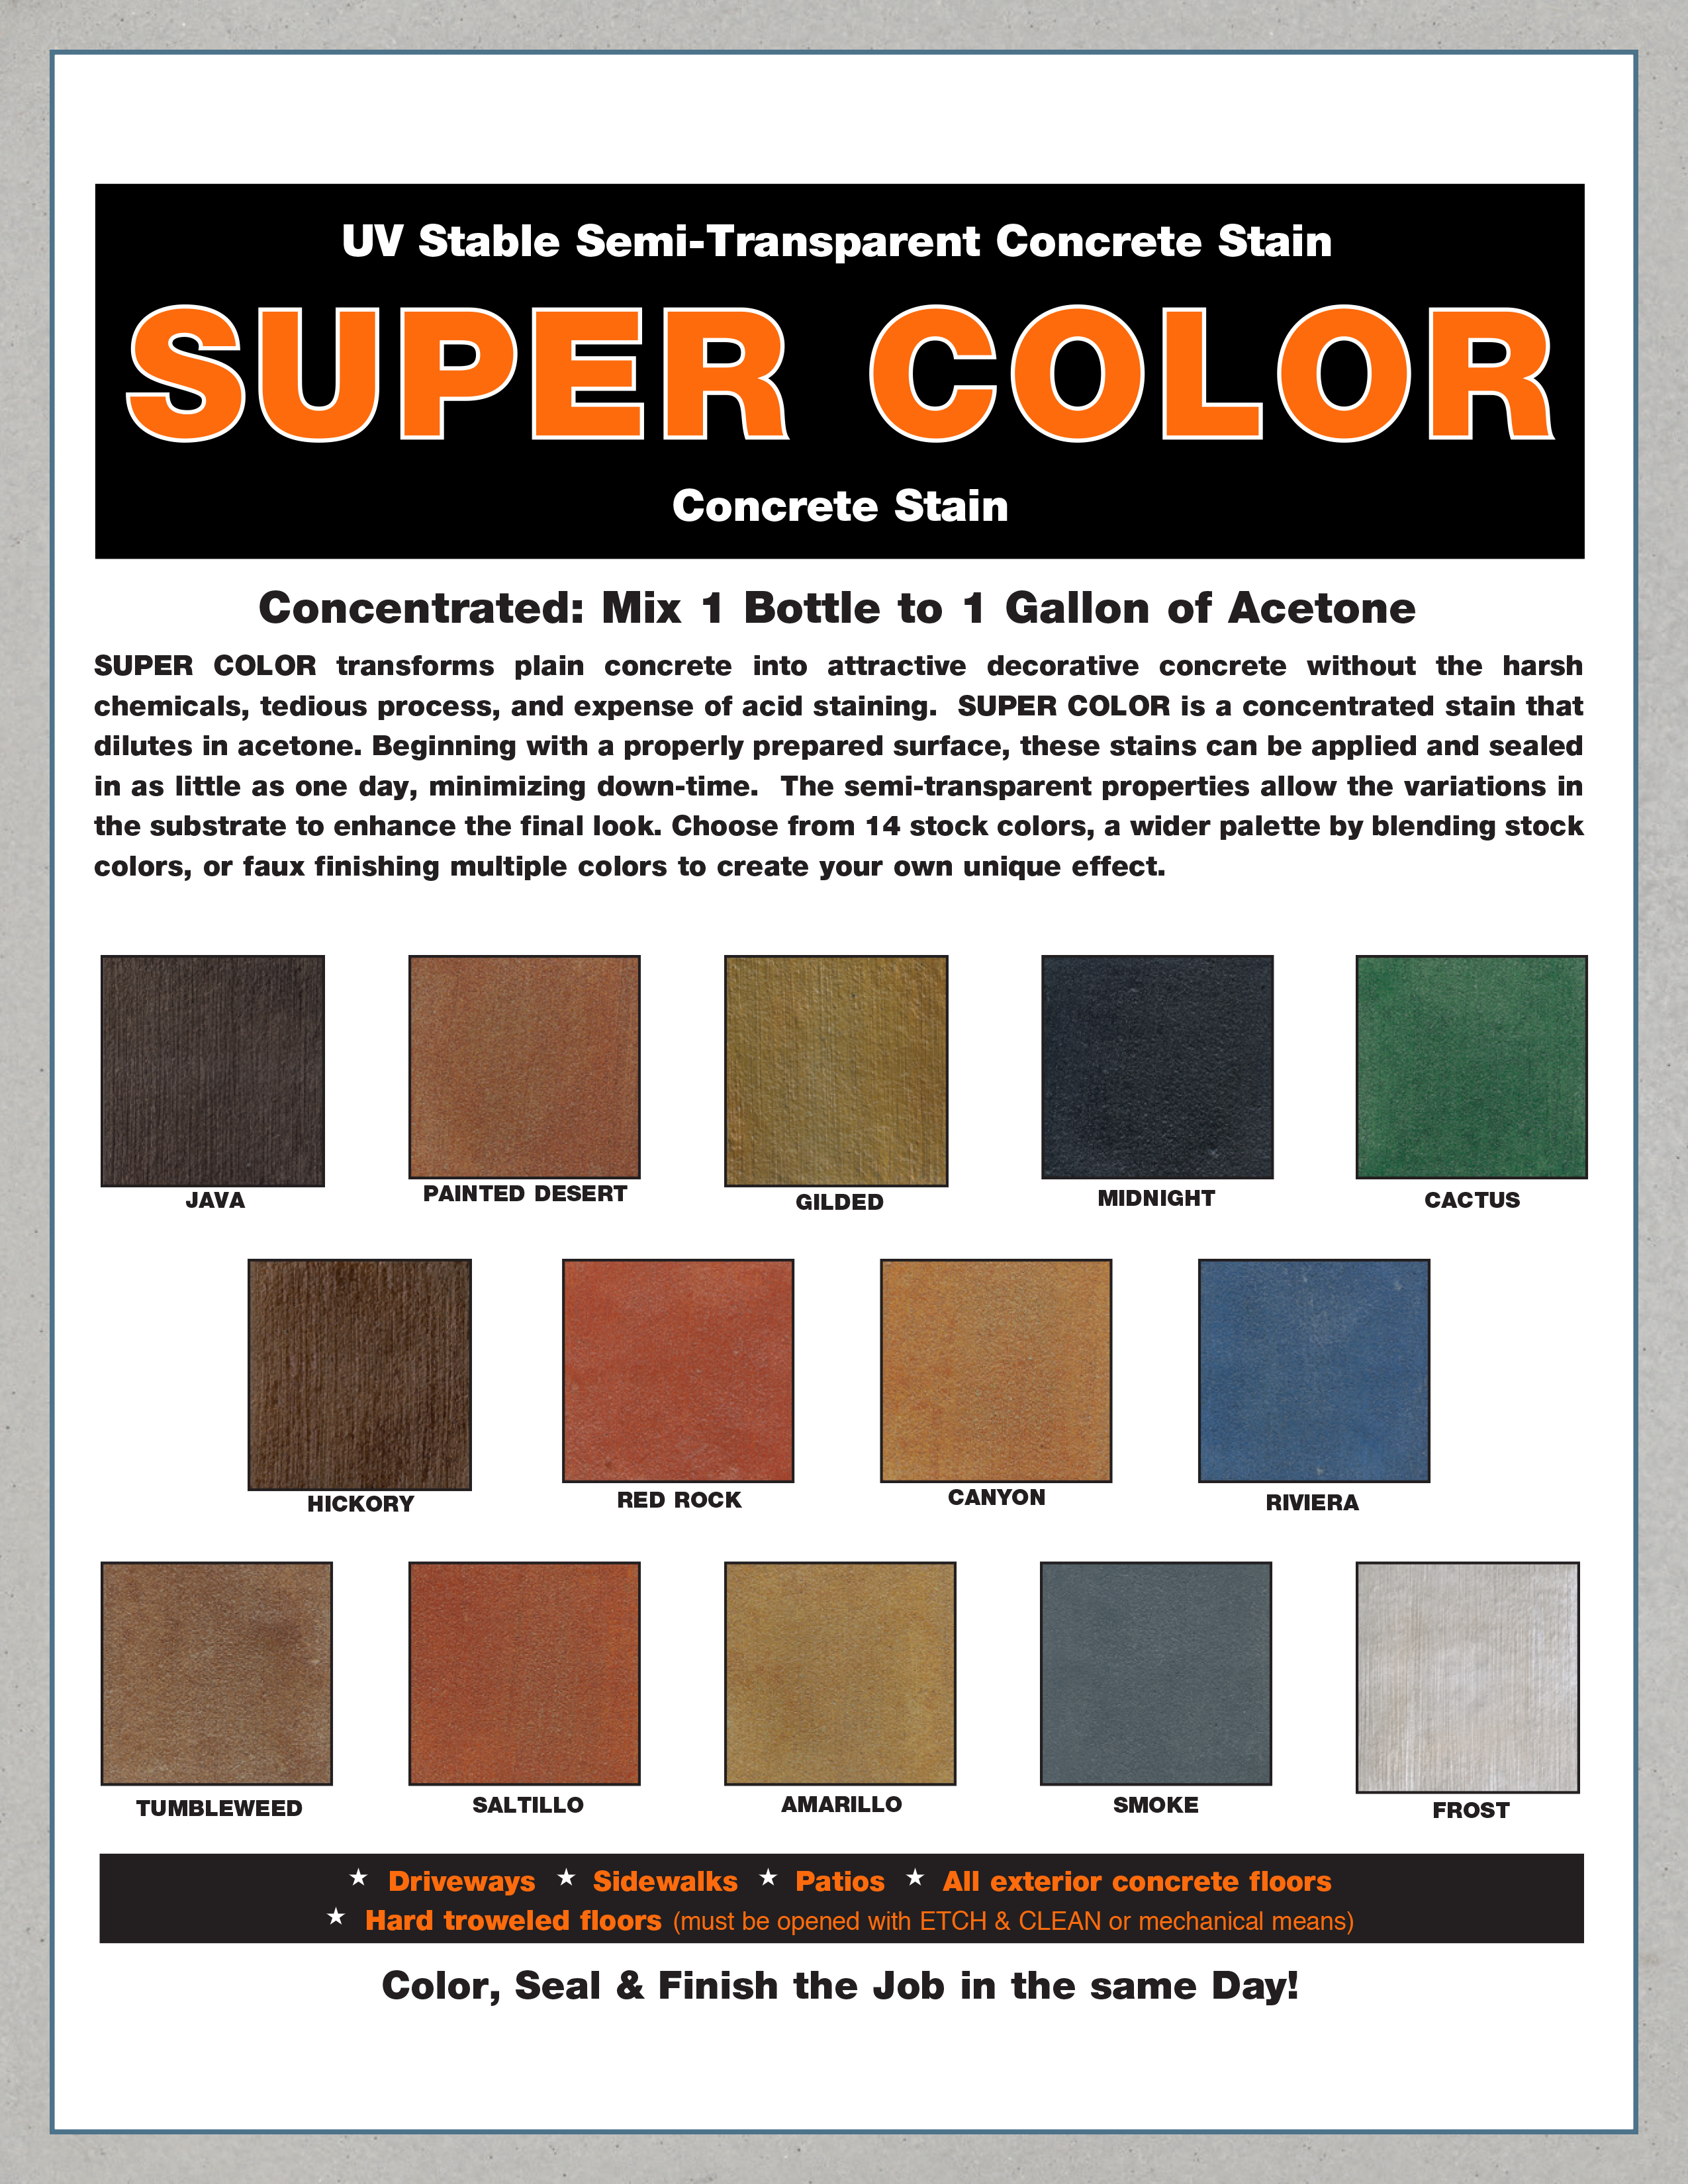 https://www.vseal.com/media/catalog/product/cache/1/image/9df78eab33525d08d6e5fb8d27136e95/s/u/super_color_exterior_acetone_dye_color_chart.png